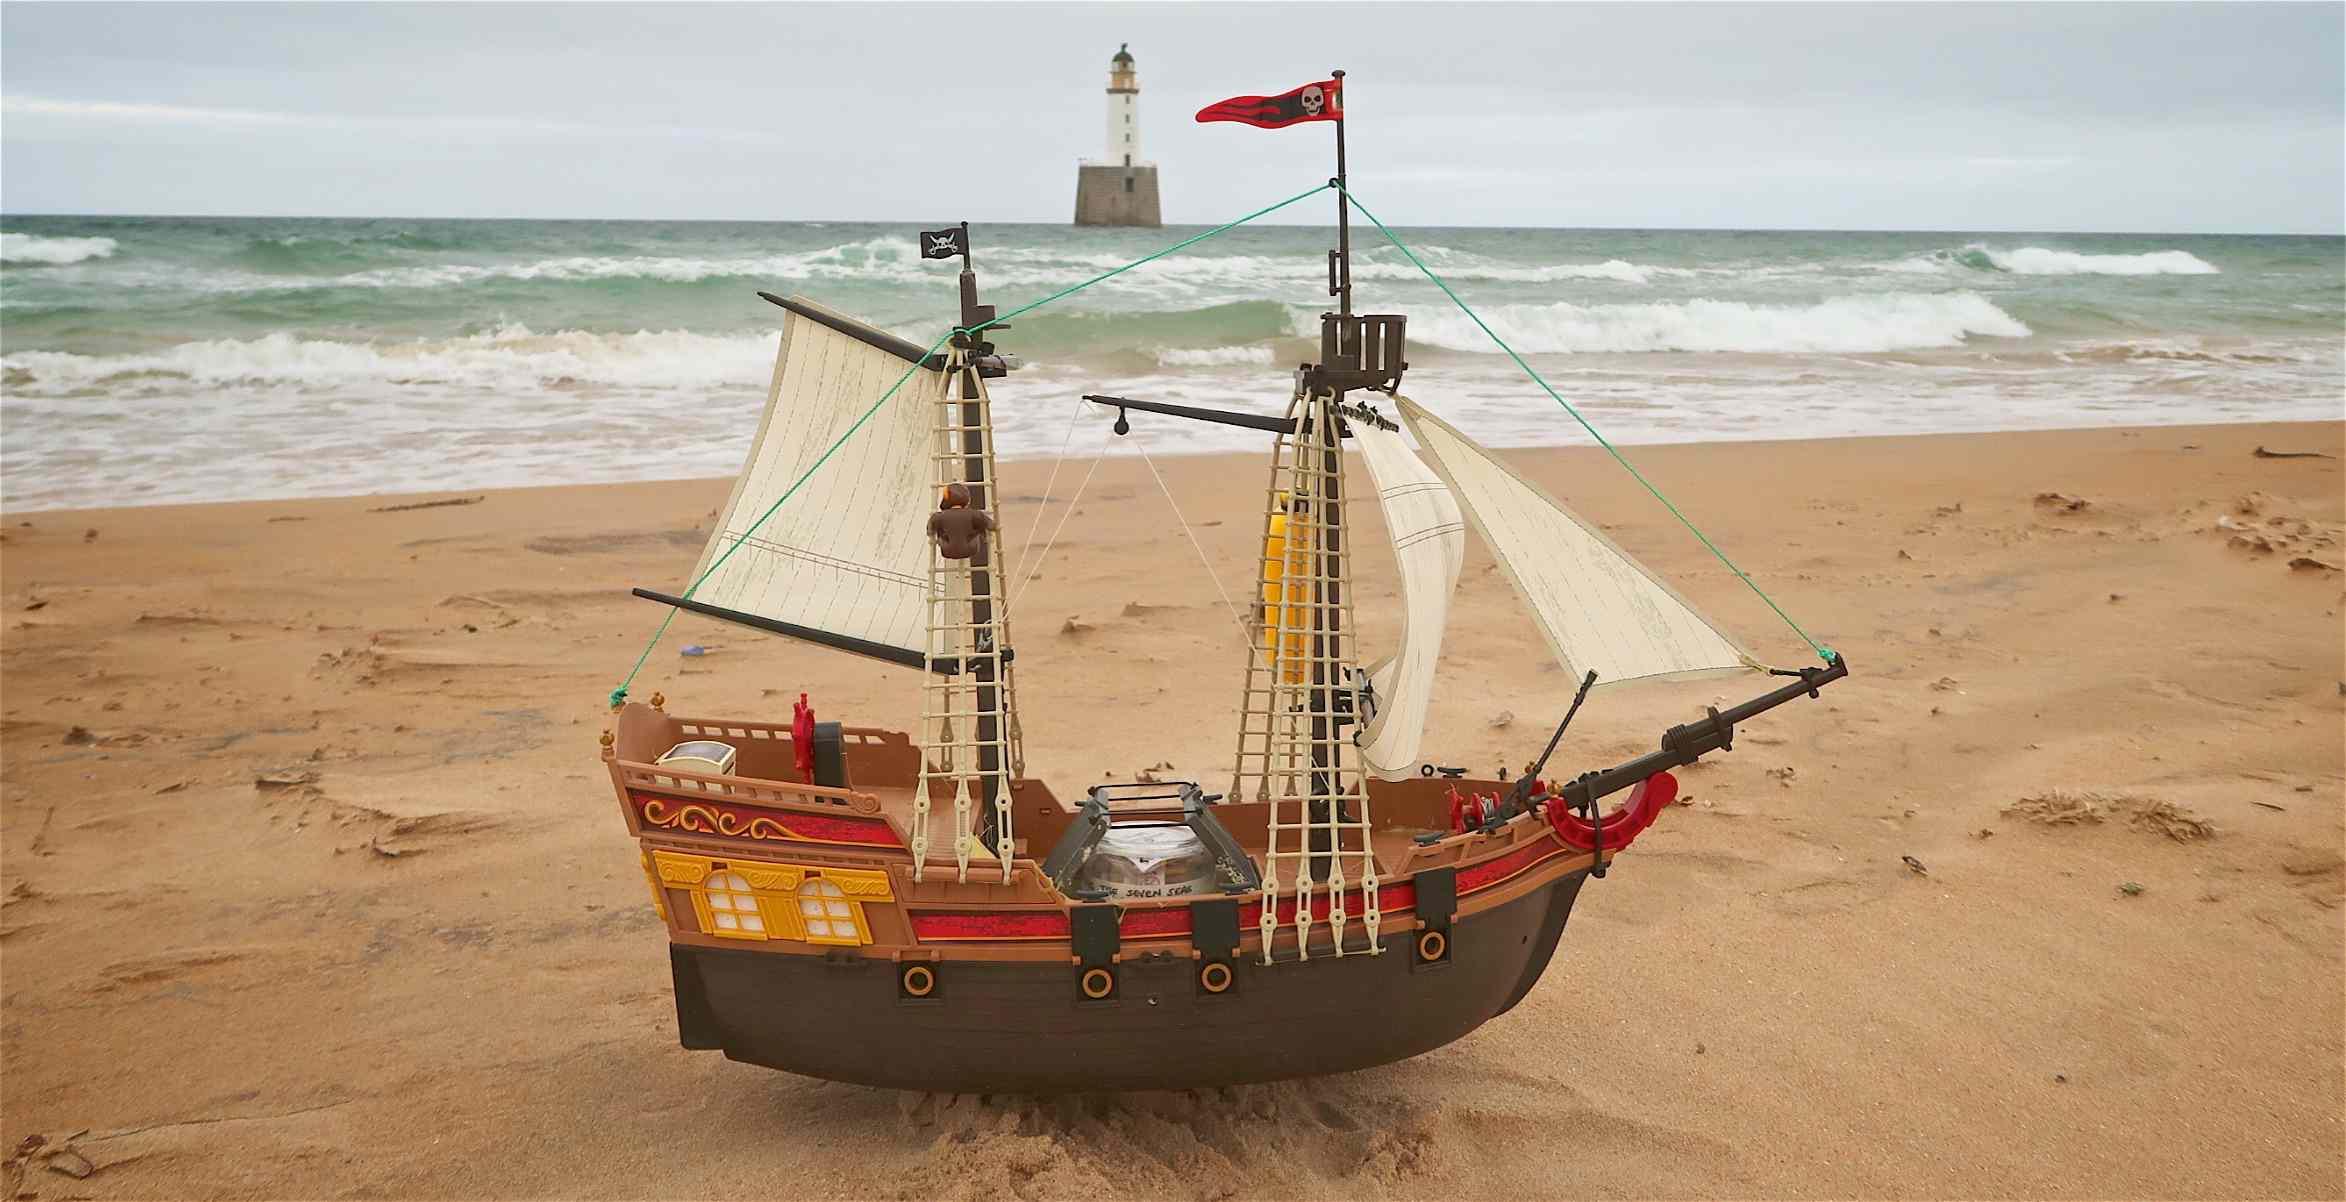 The Adventure pirate ship